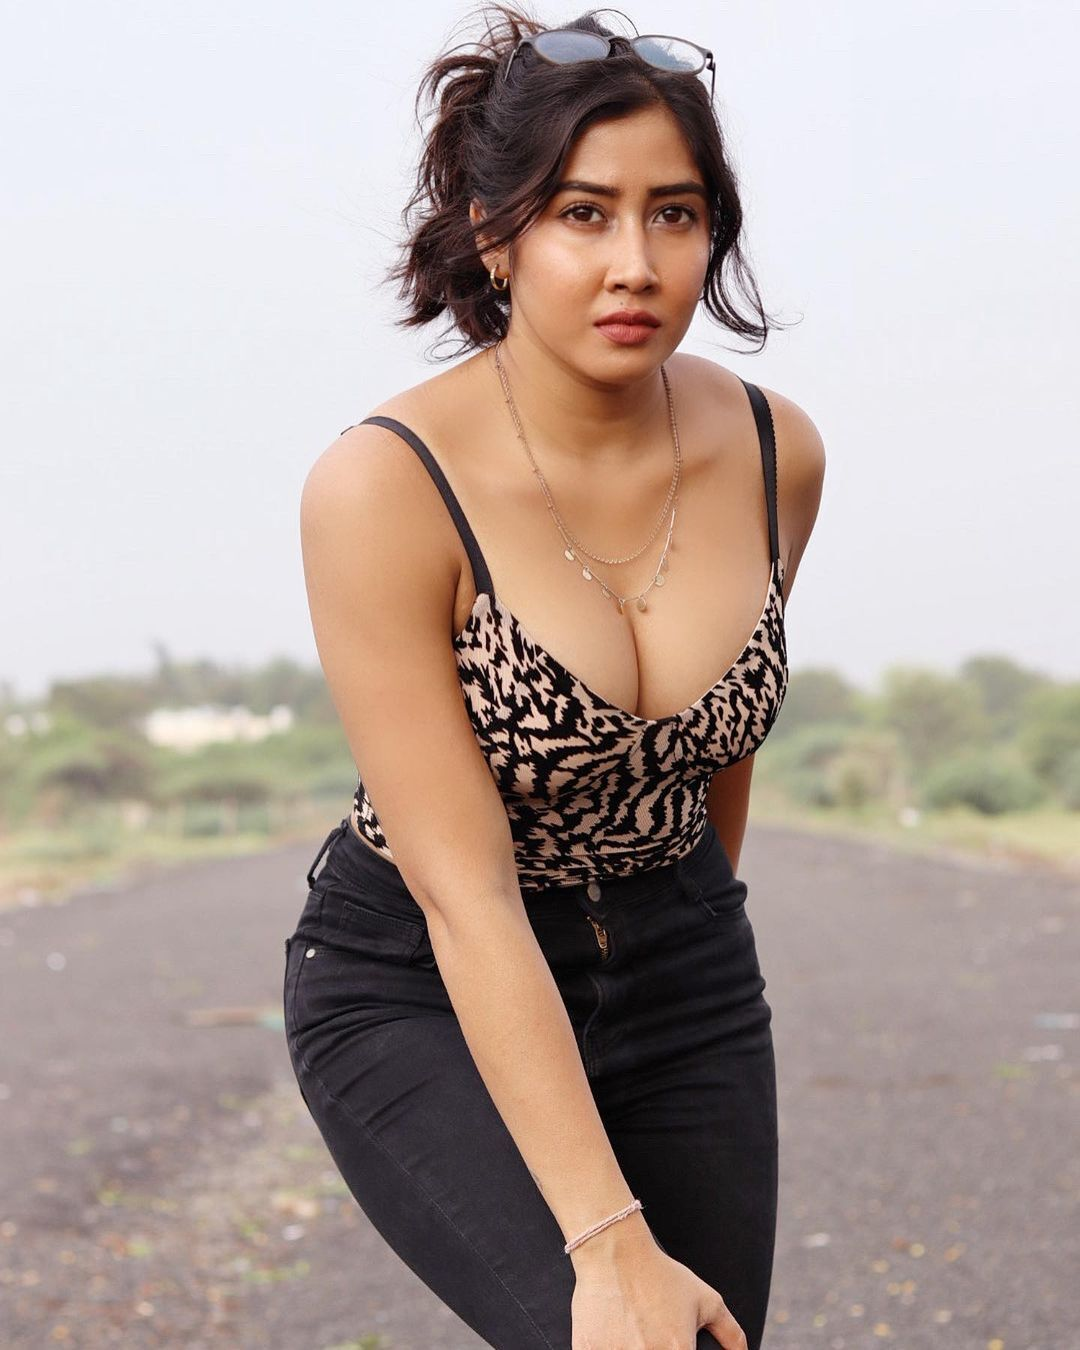 Sofia Ansari Hot Photo